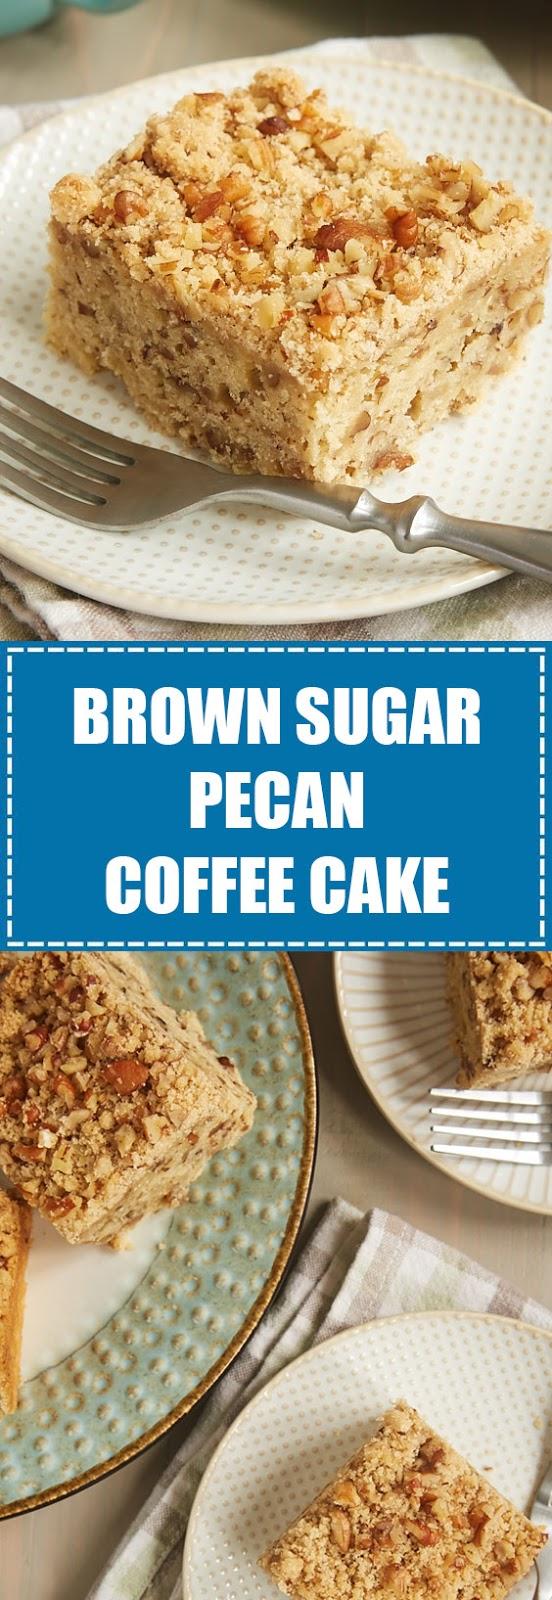 Brown Sugar Pecan Coffe Cake